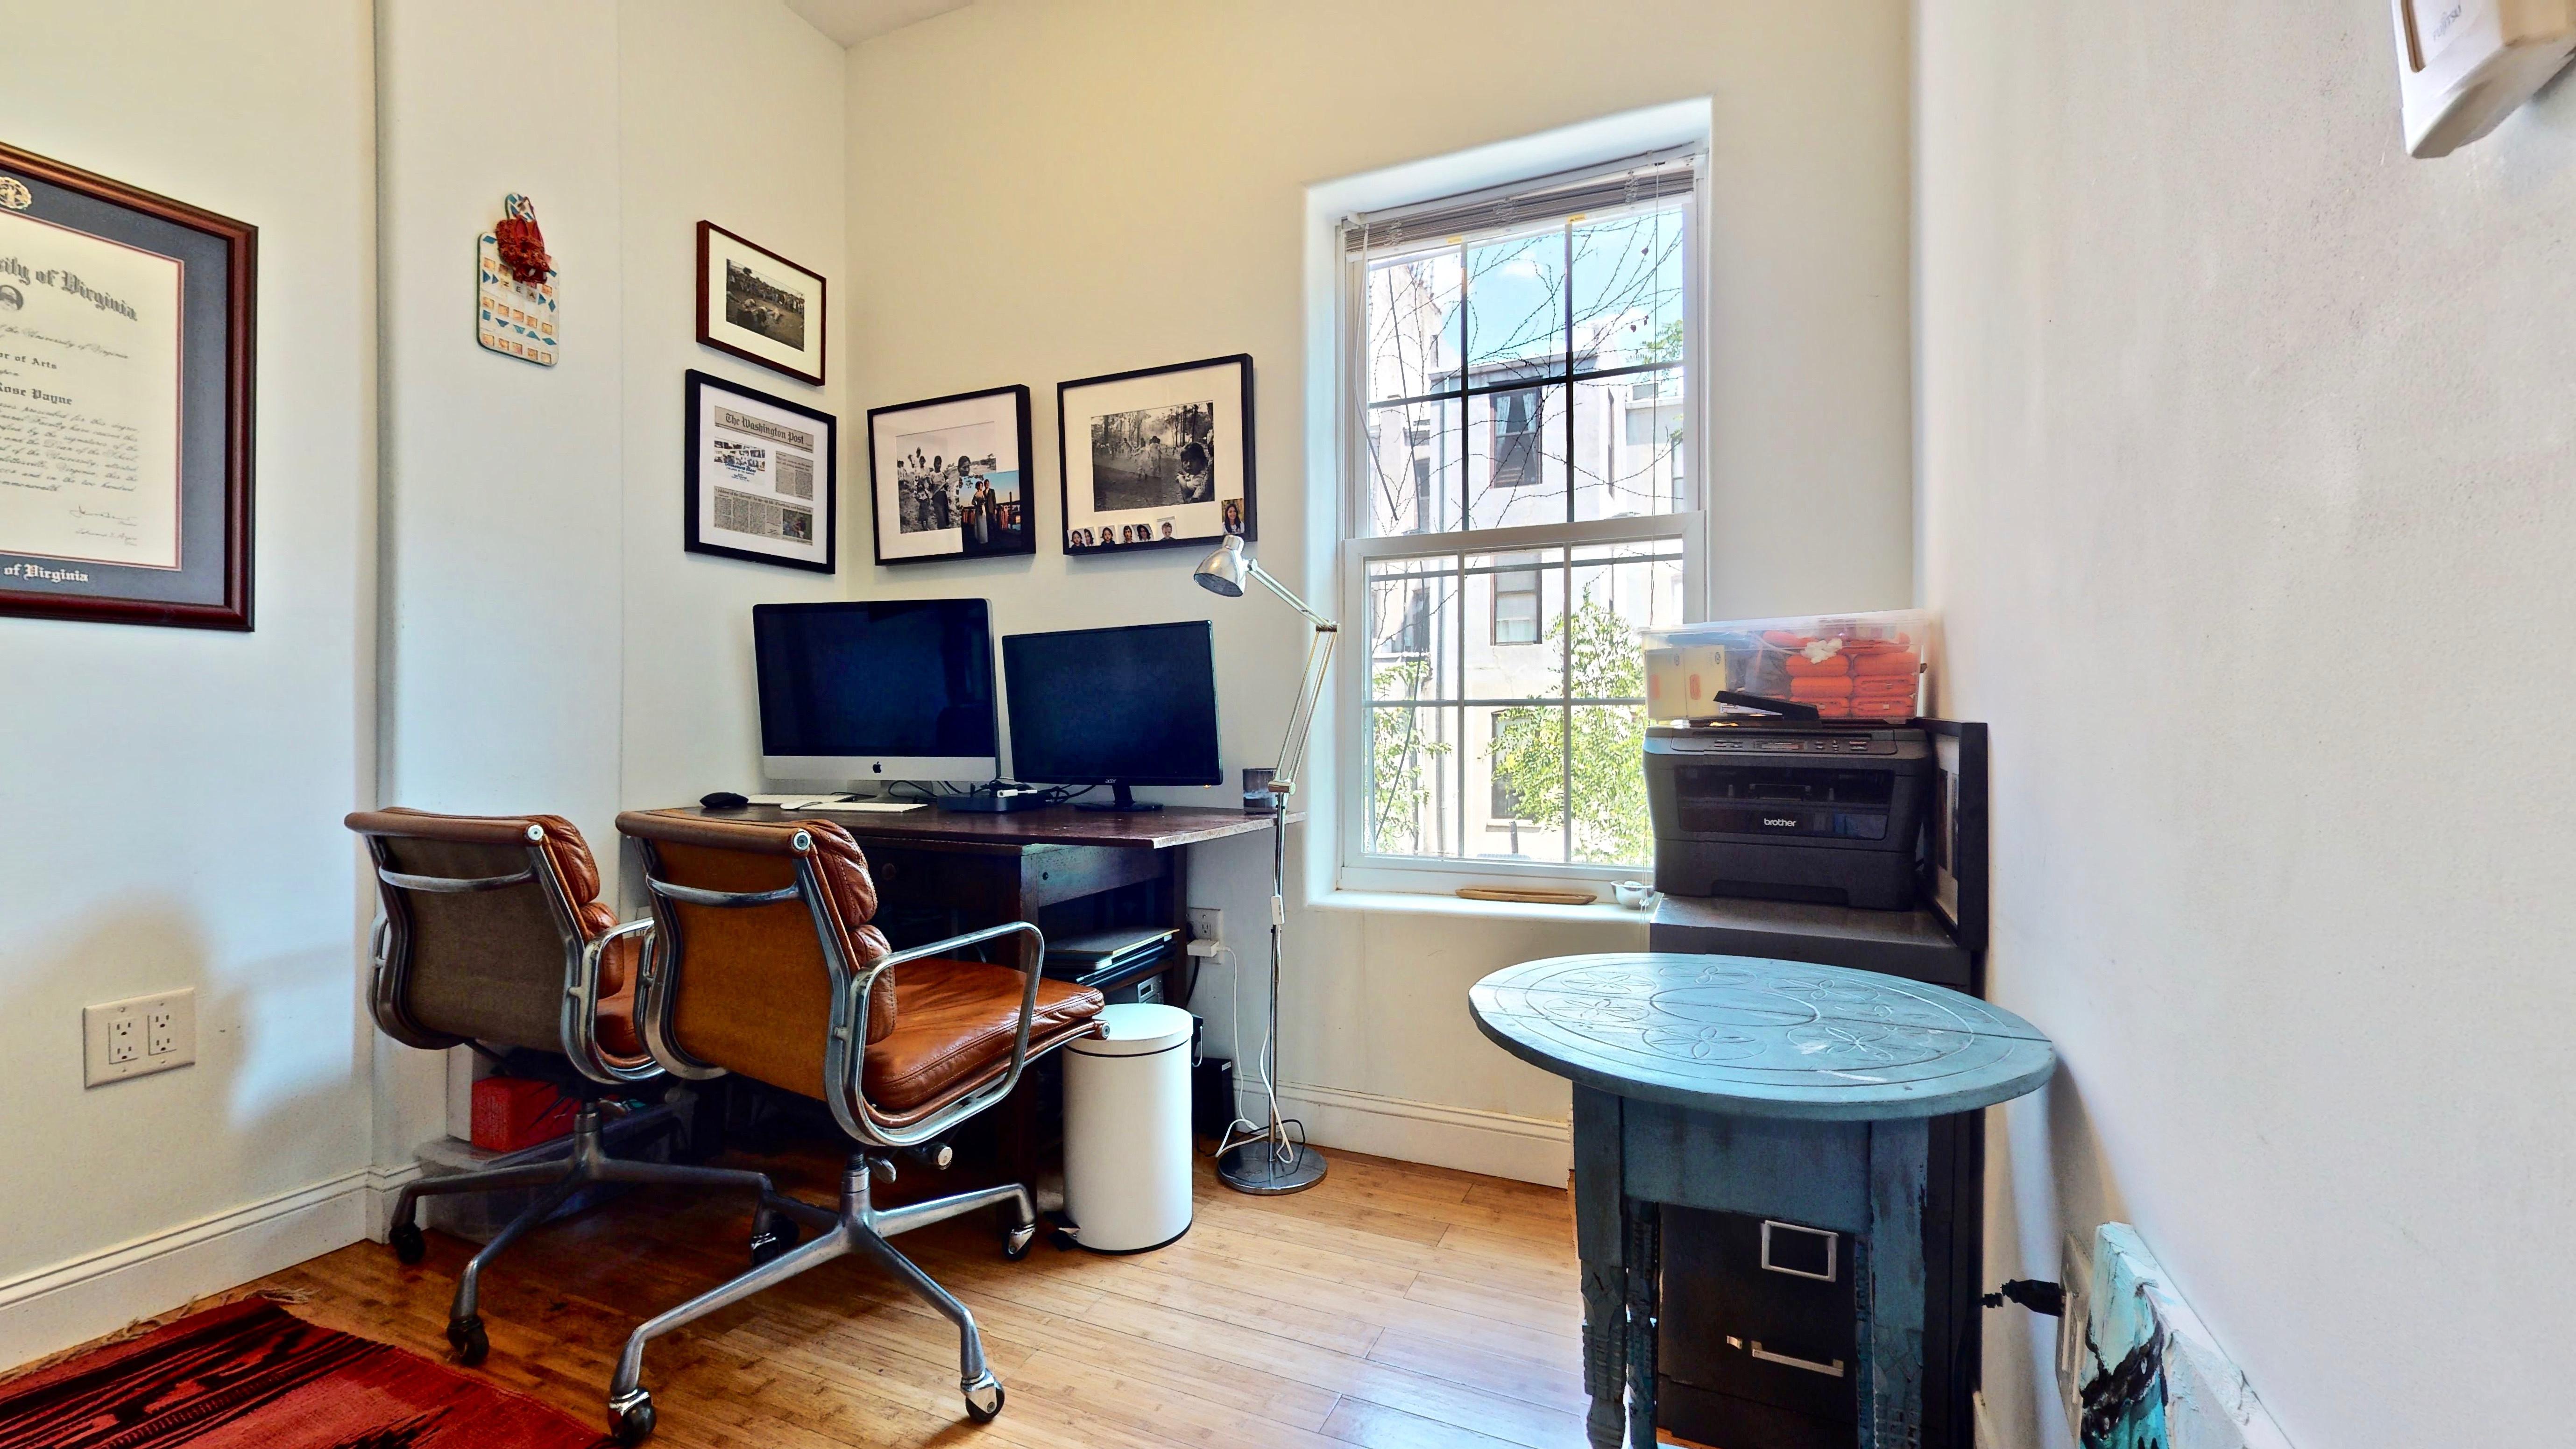 563 West 182nd Street Washington Heights New York NY 10033